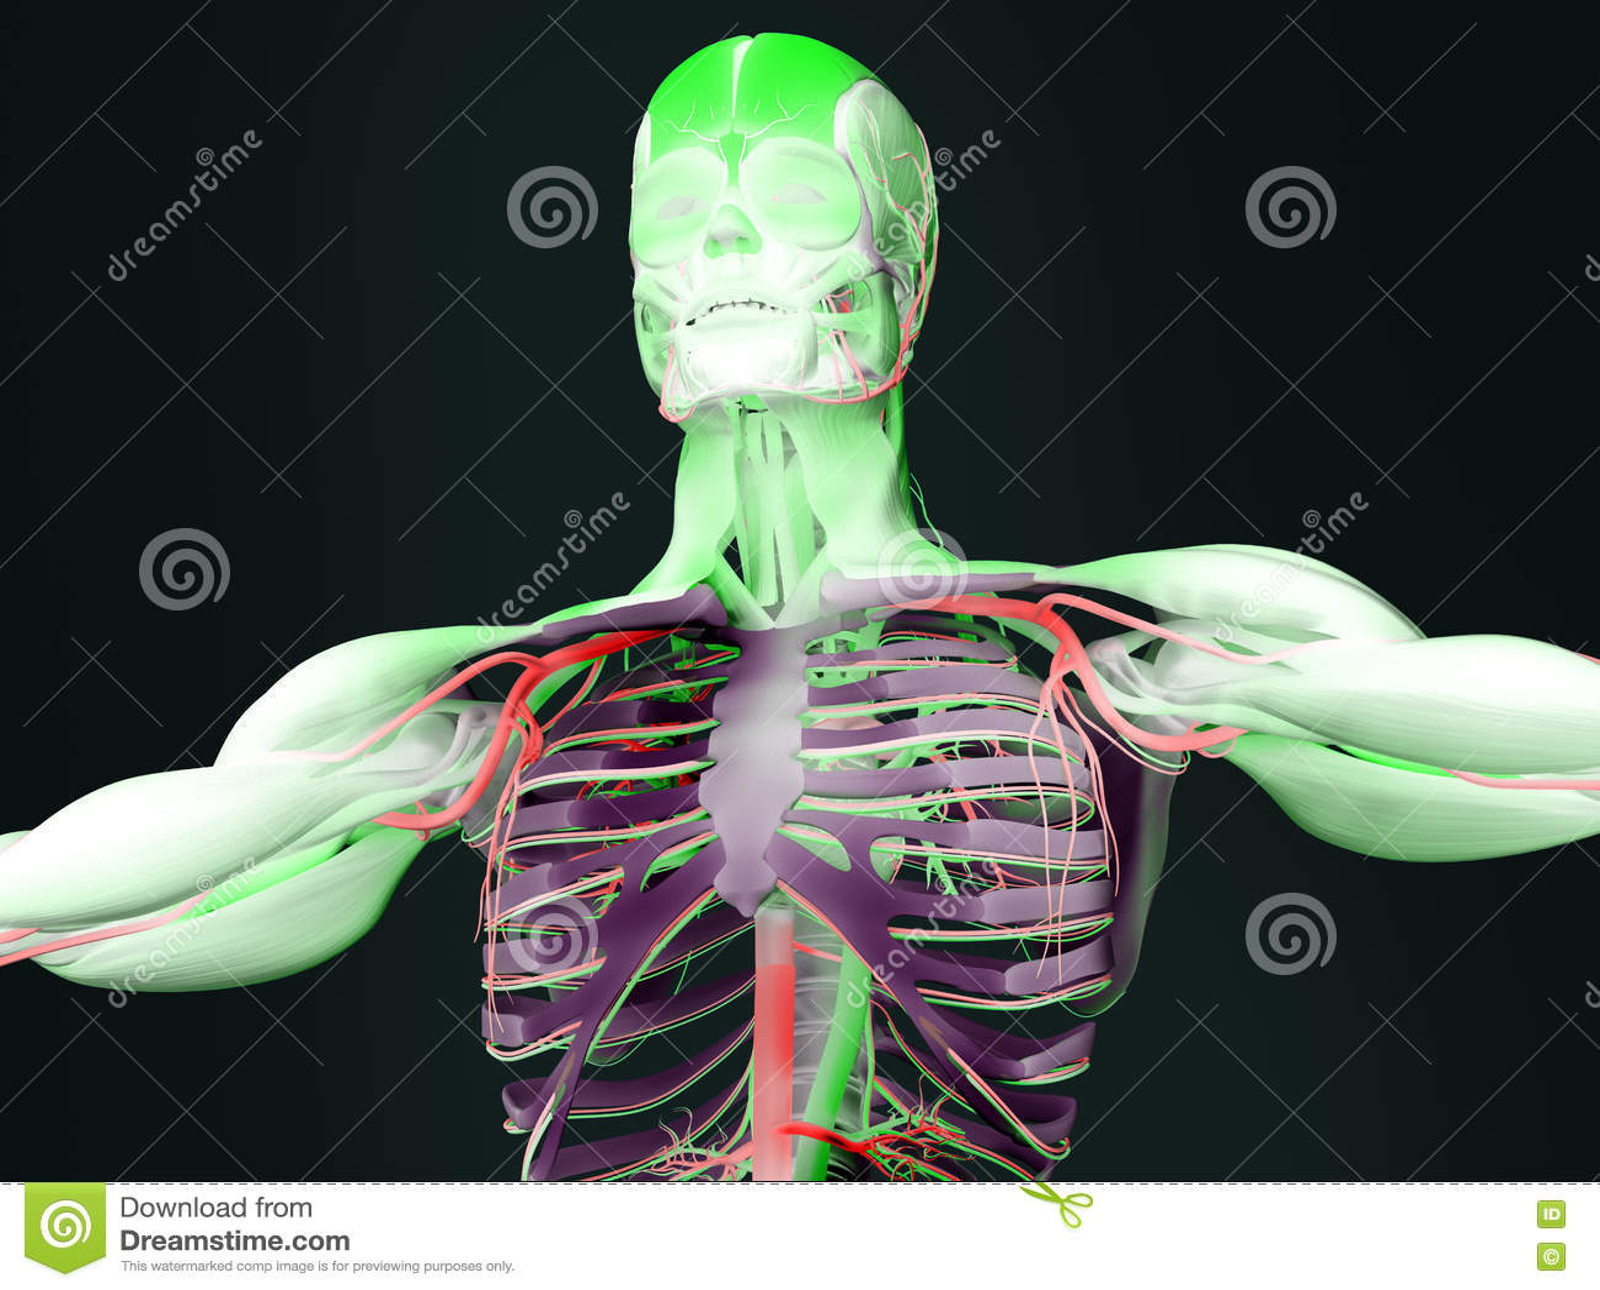 Human anatomy torso stock illustration. Illustration of artistic ...